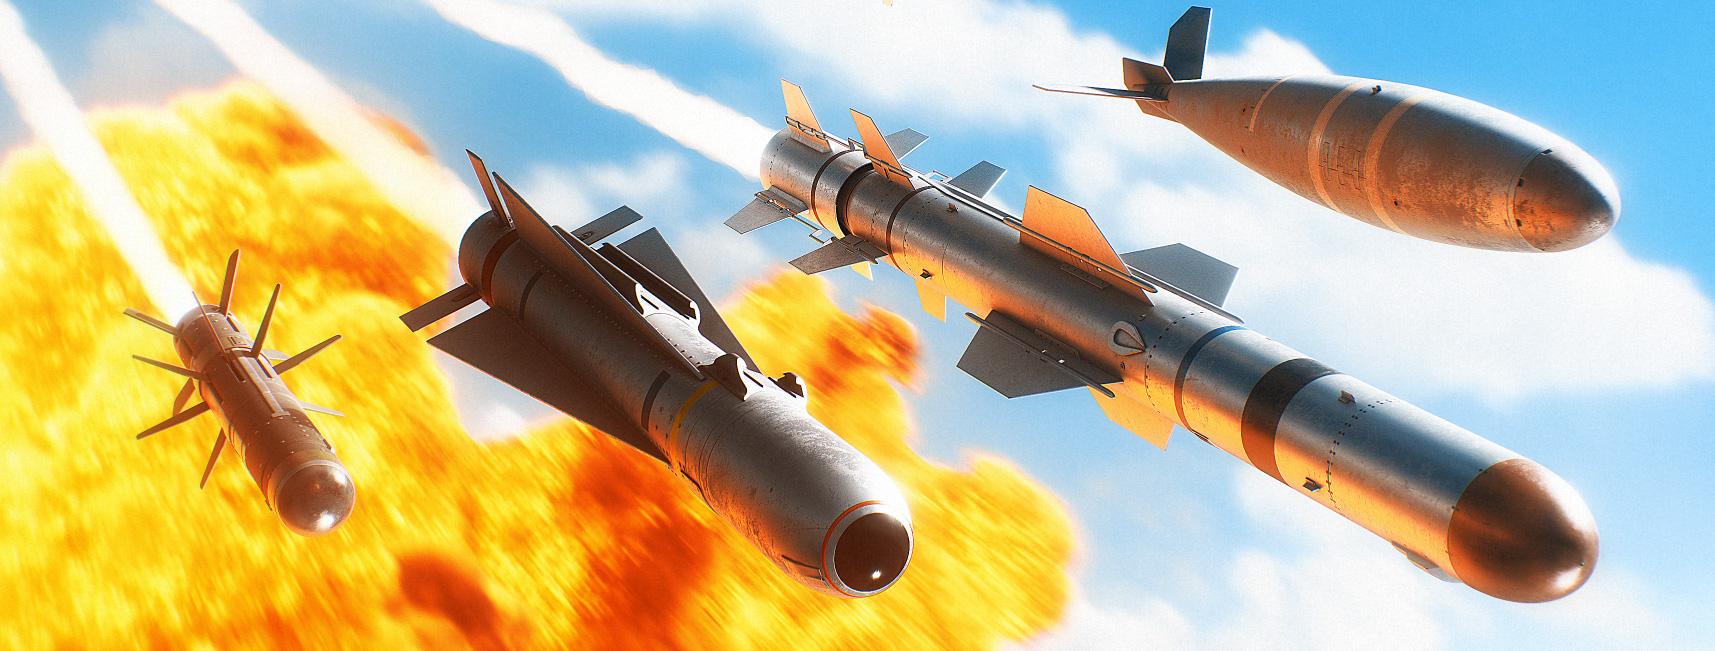 Download Photorealistic Missile 3D Models